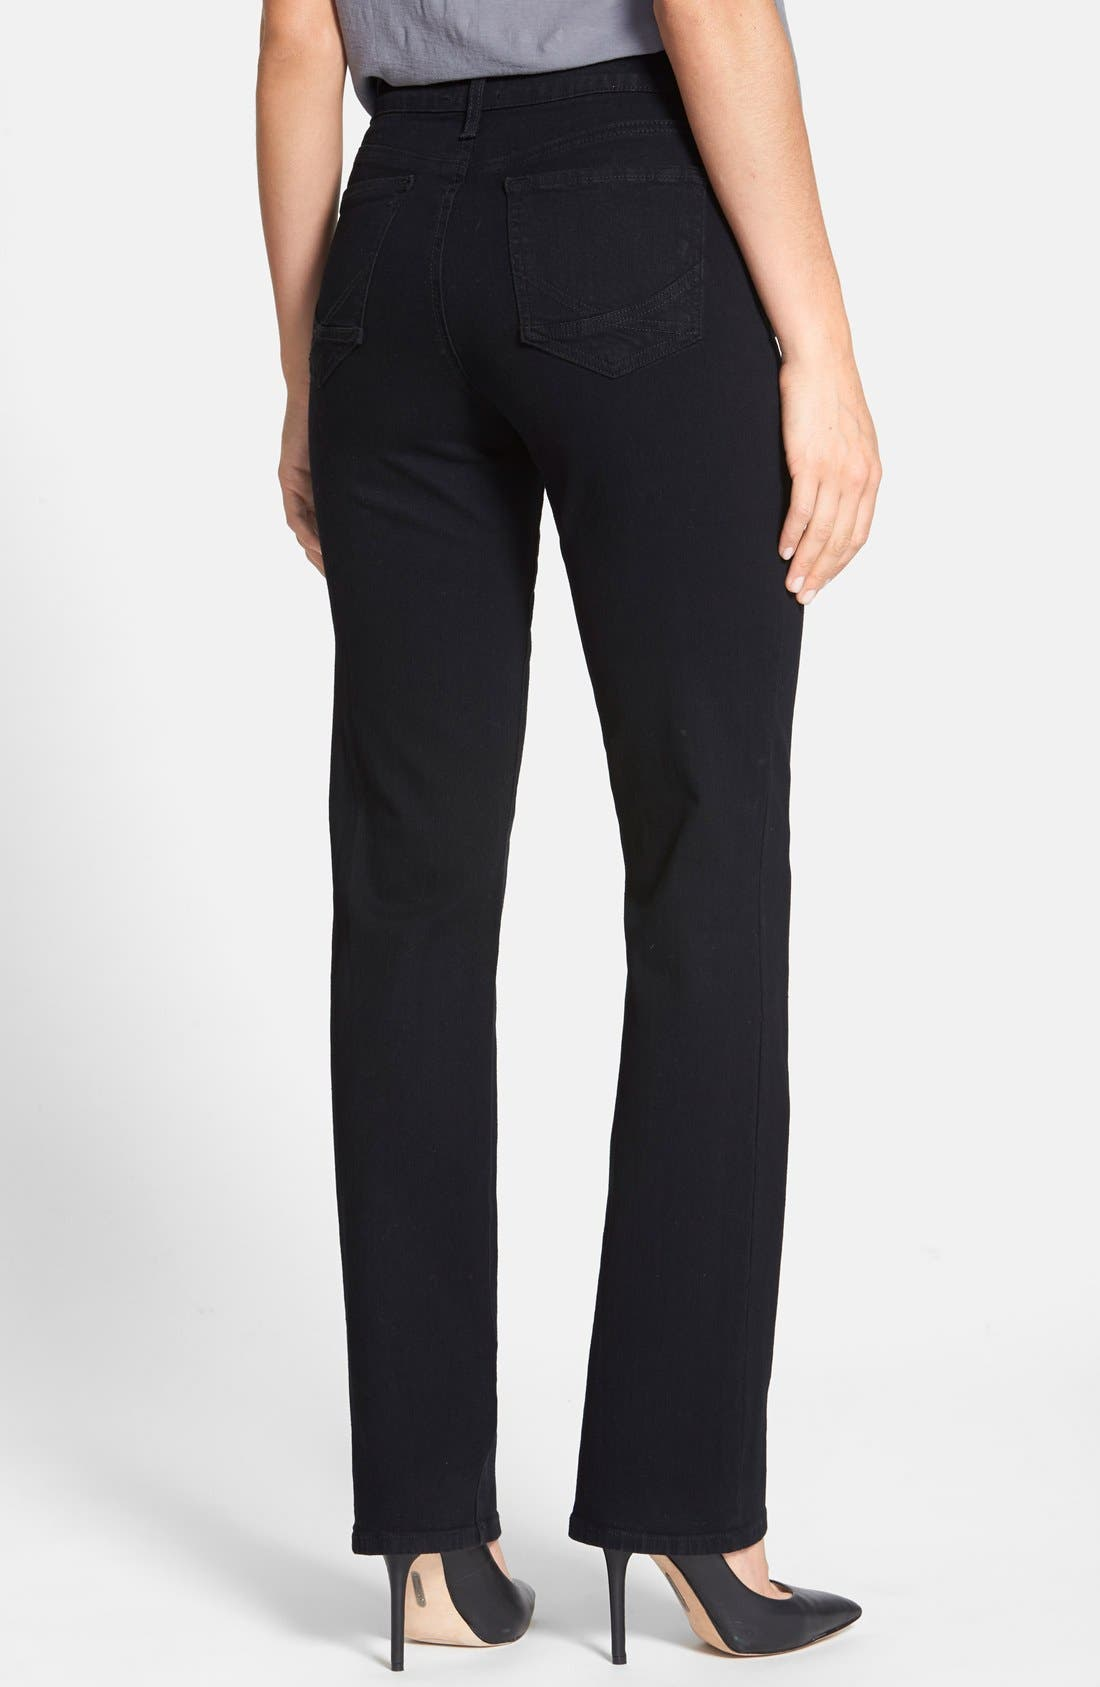 'Marilyn' Stretch Straight Leg Jeans,                             Alternate thumbnail 2, color,                             Black